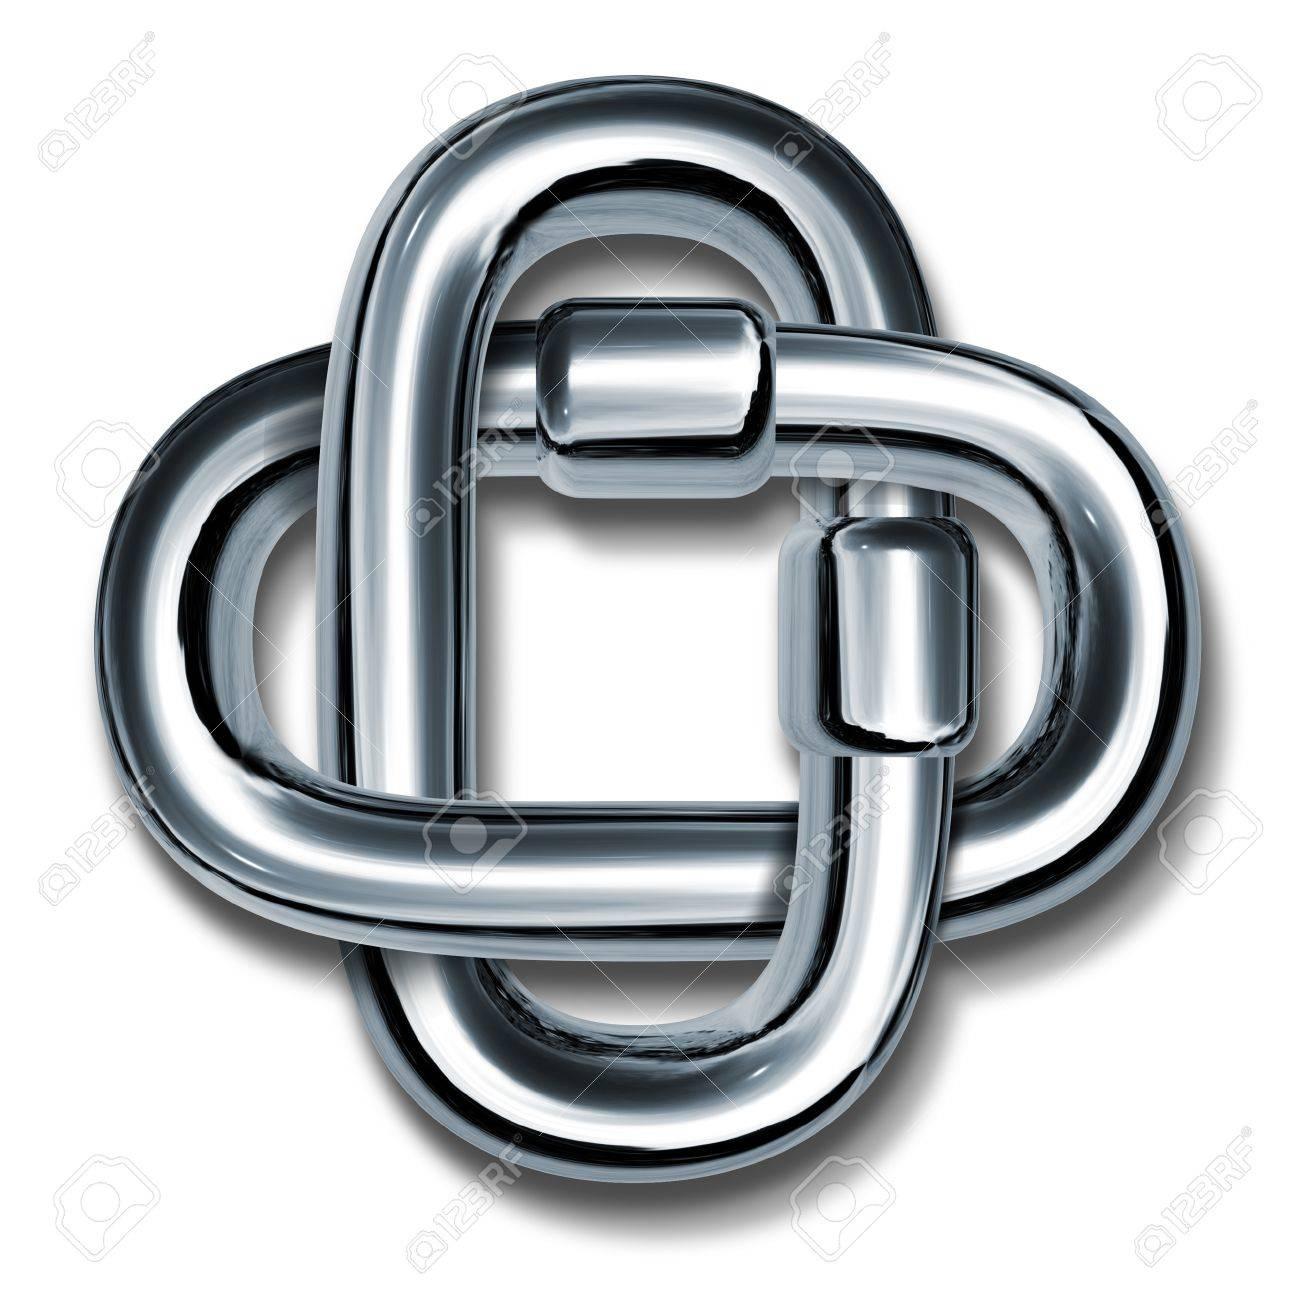 Metal chain links linked together to form a cross symbol metal chain links linked together to form a cross symbol representing unity strength and teamwork working buycottarizona